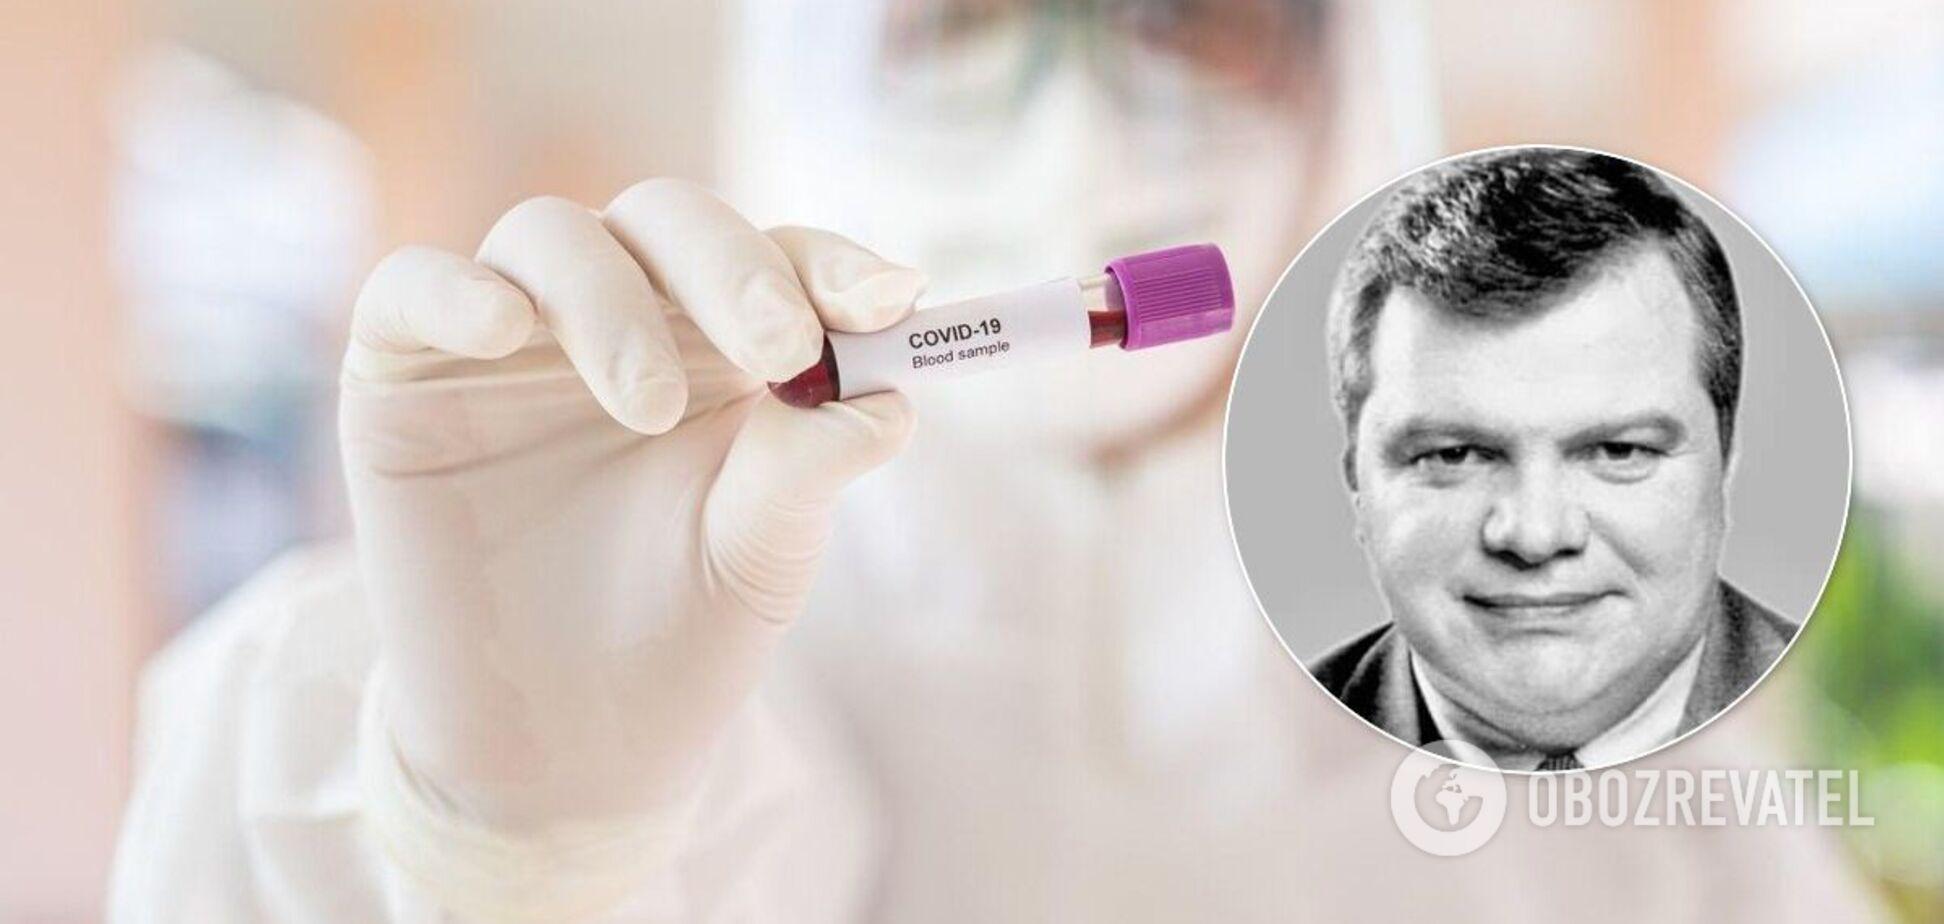 От коронавируса умер нардеп 3-го созыва Валерий Бабич